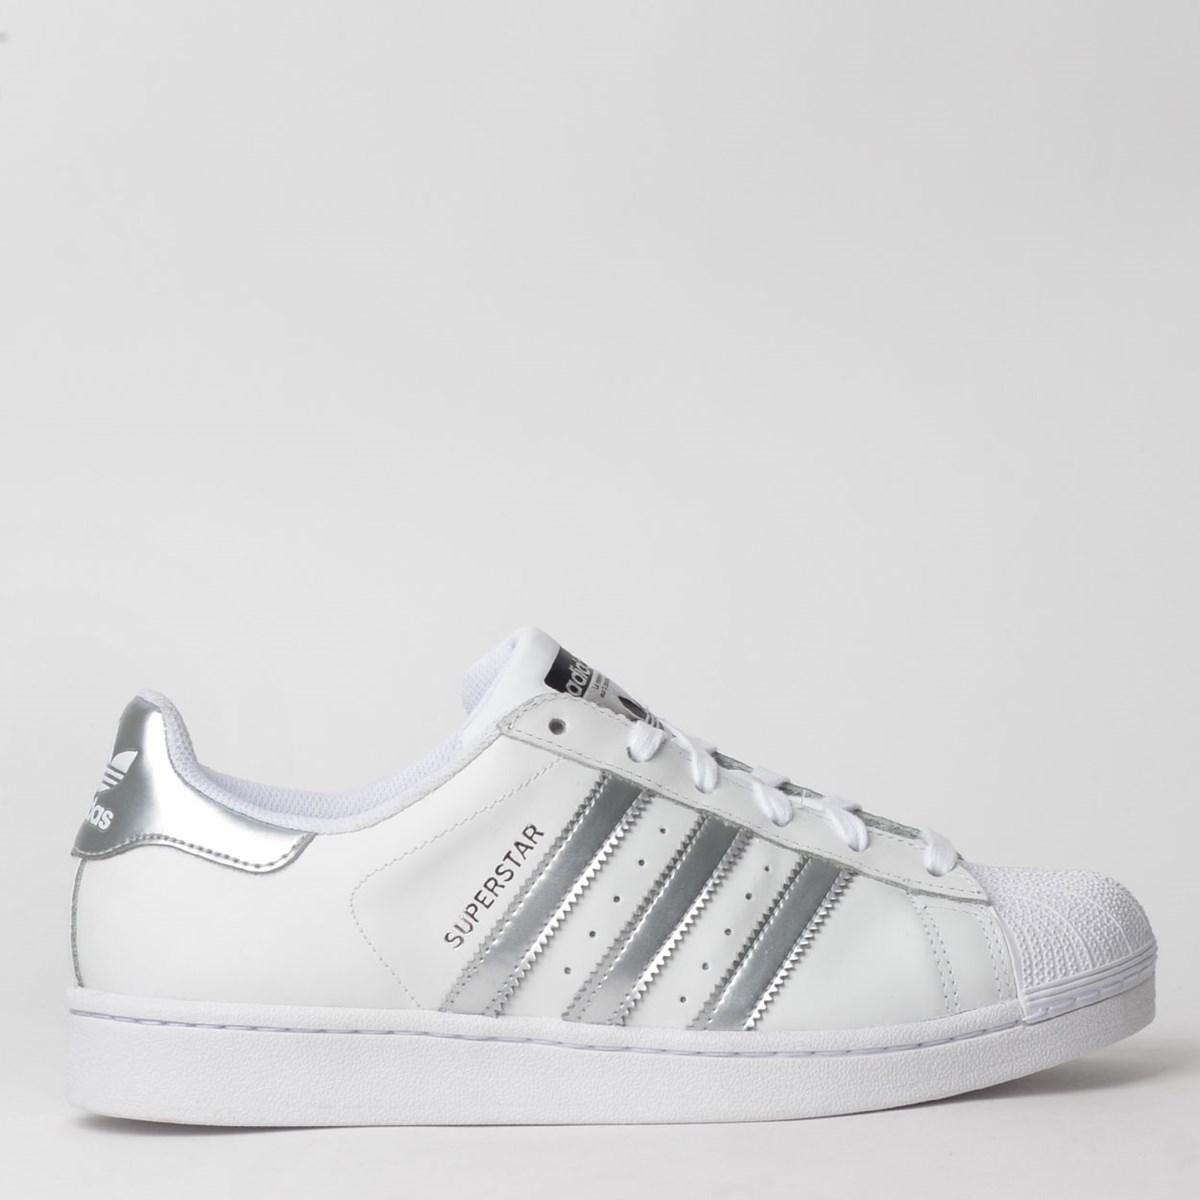 Tênis Adidas Superstar W Branco Prata AQ3091